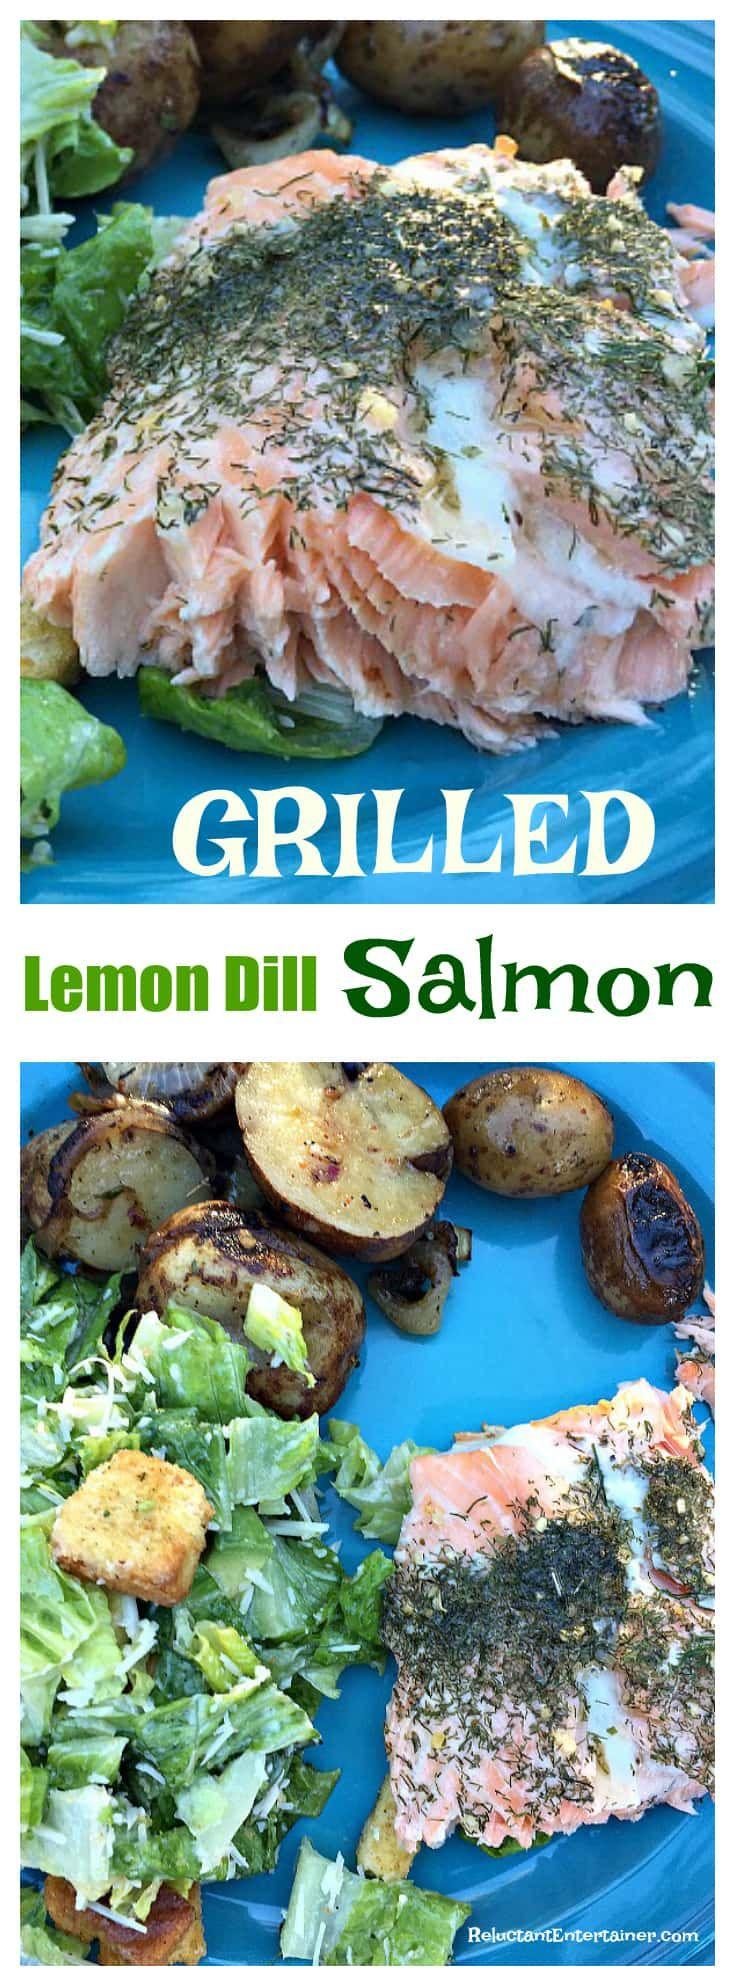 Grilled Lemon Dill Salmon